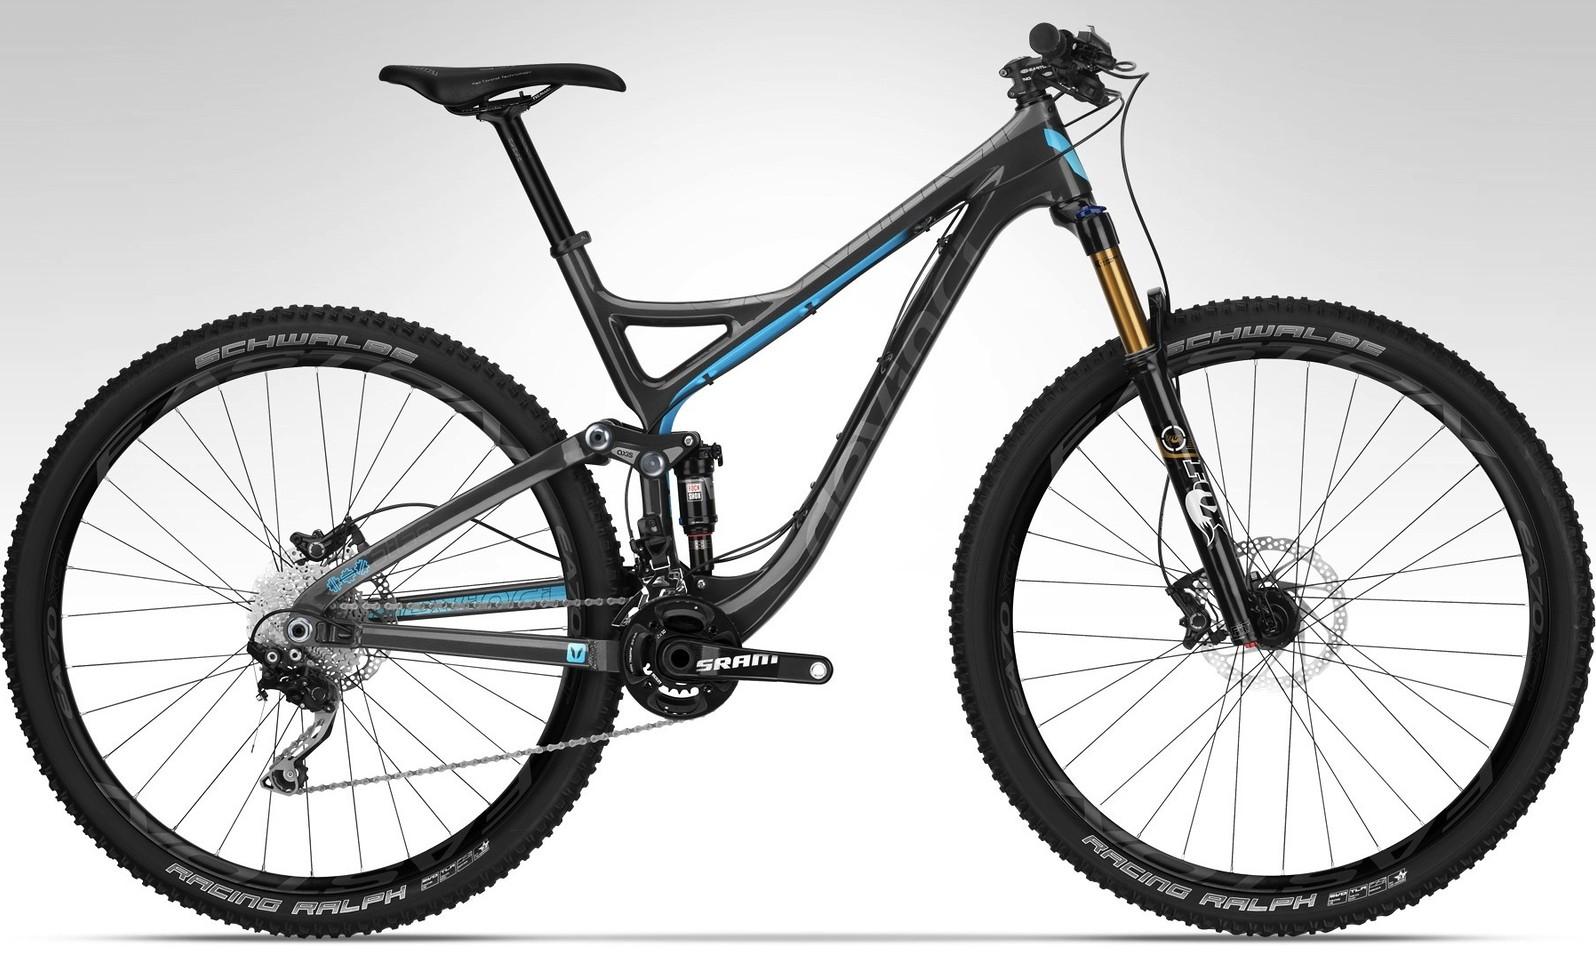 Devinci ATLAS CARBON SL bike